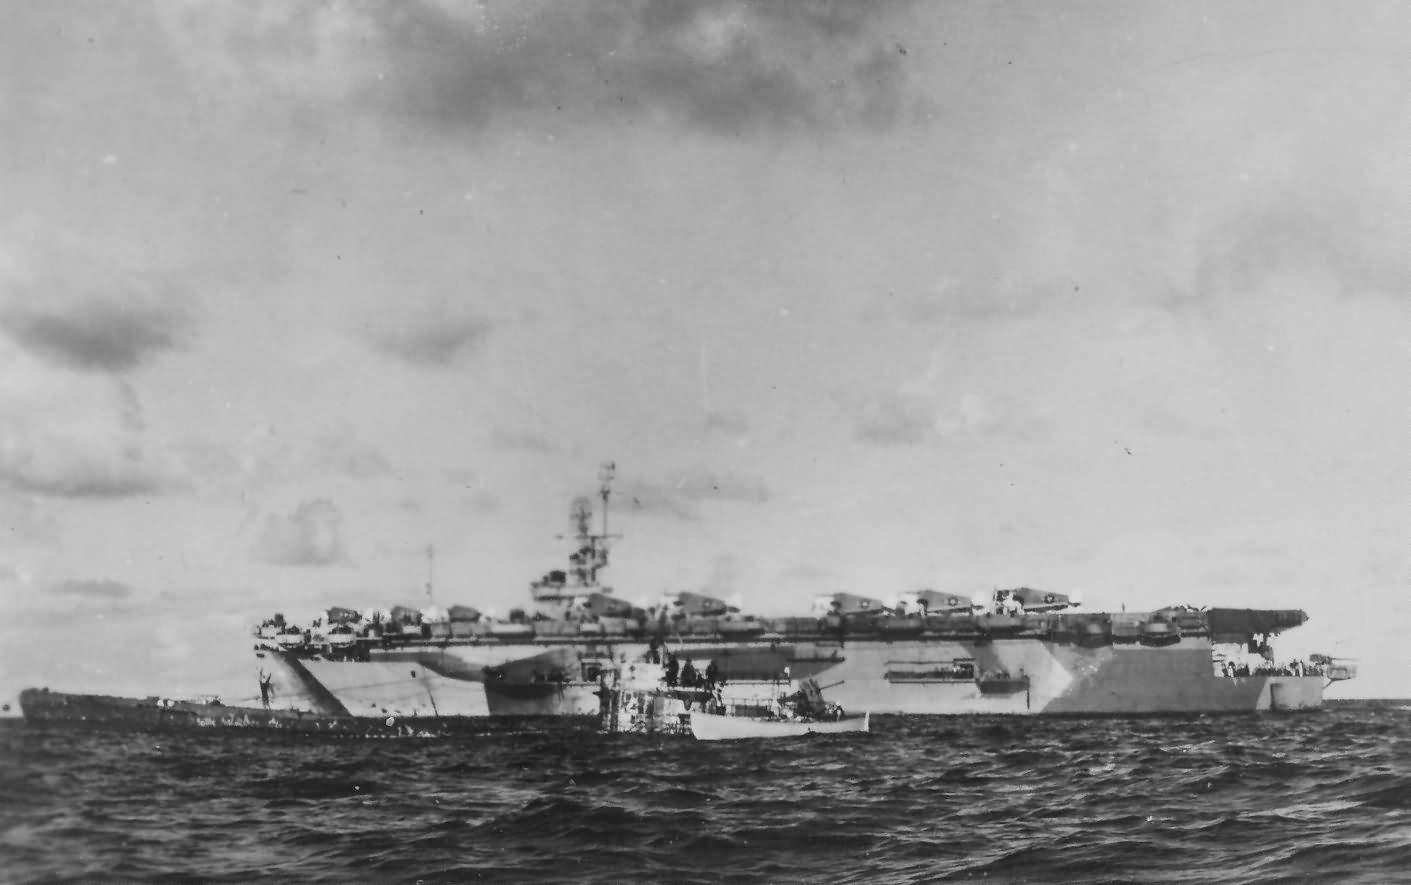 Escort carrier USS Guadalcanal CVE-60 and U-boat U-505 June 1944